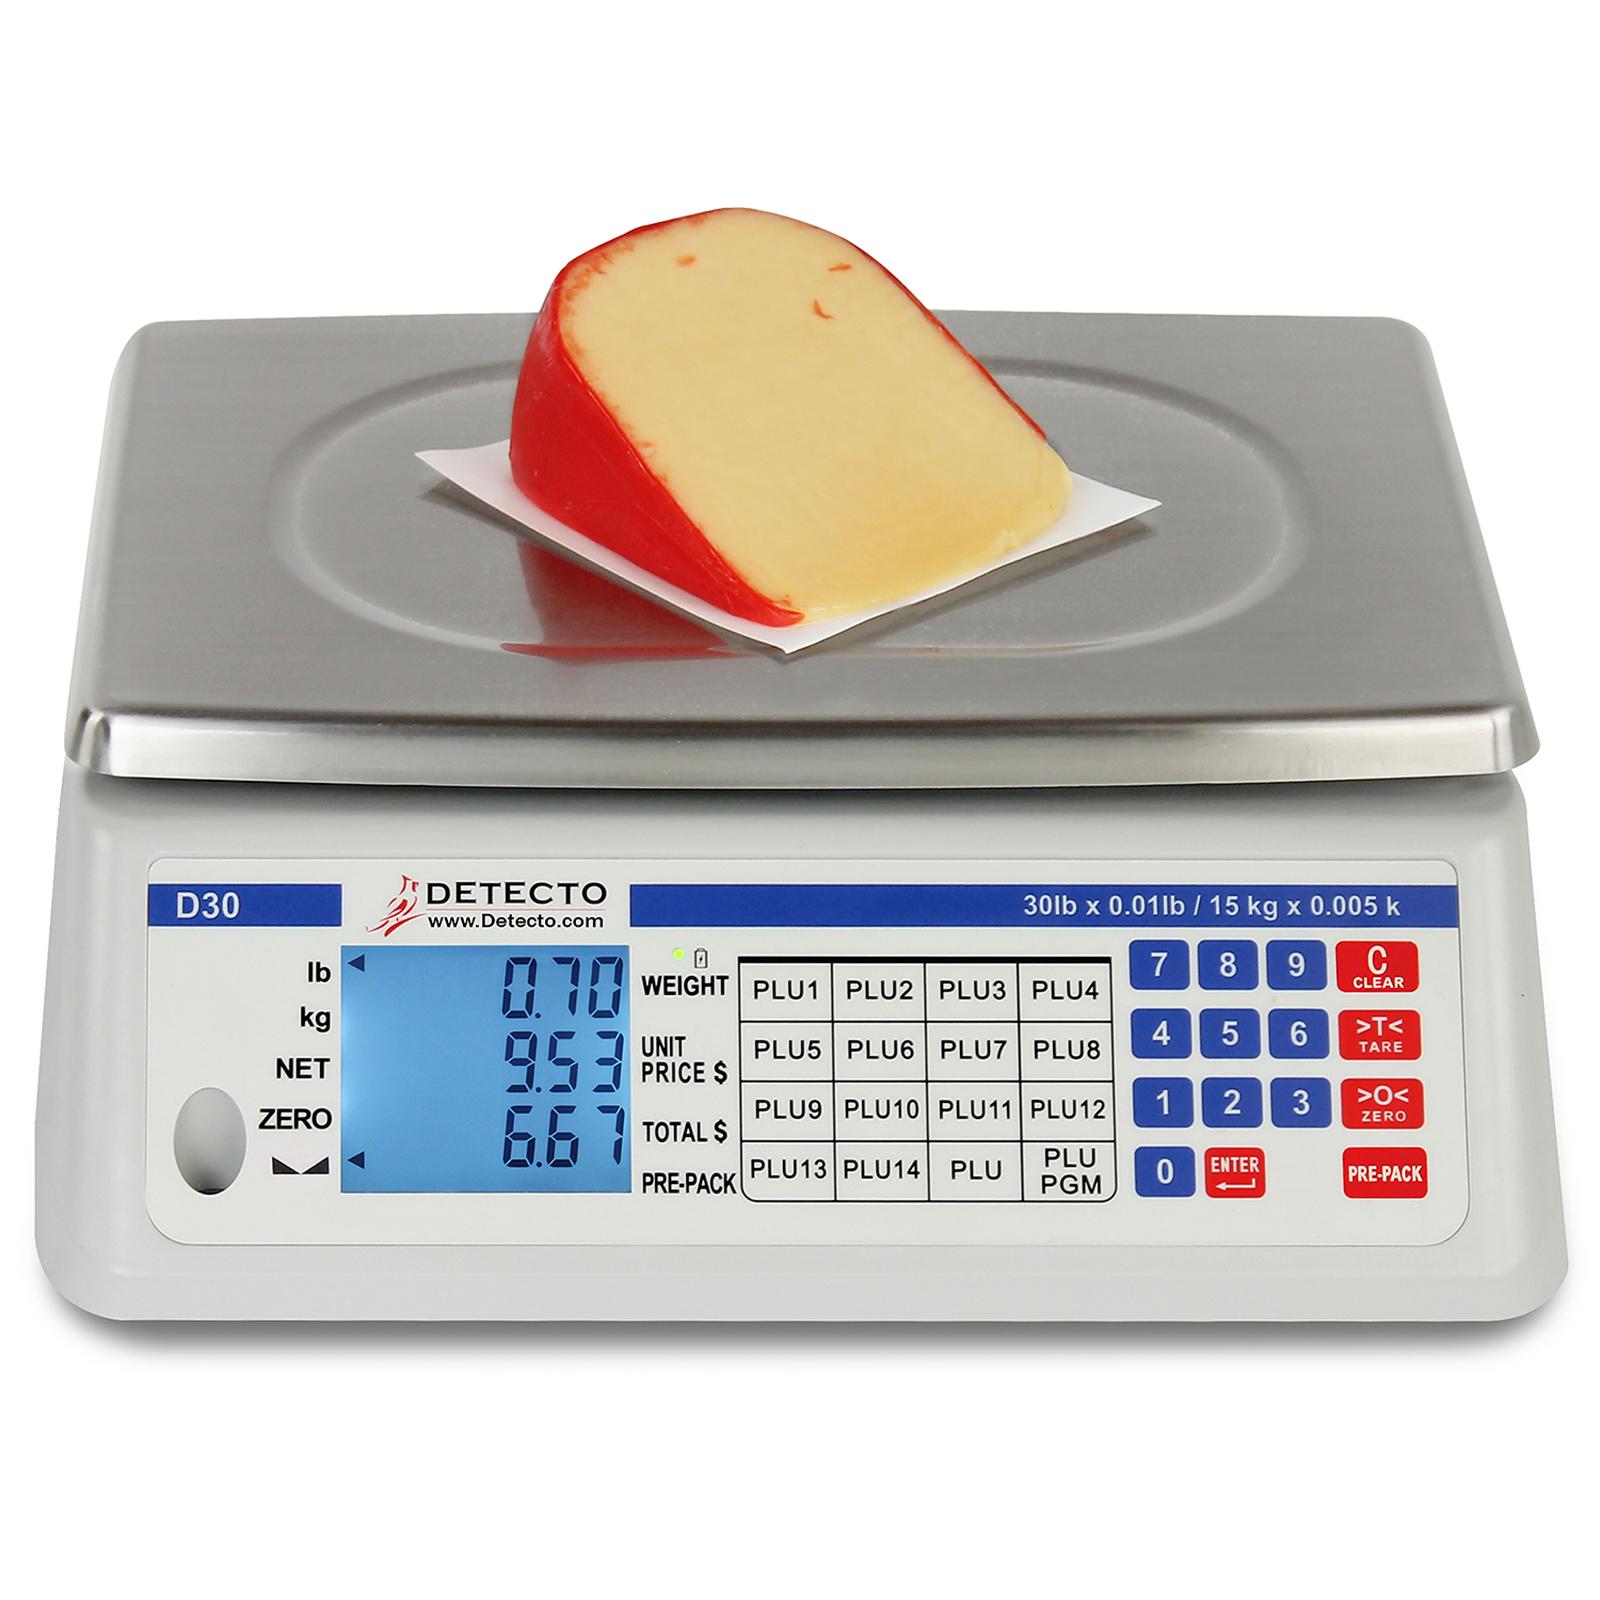 Detecto D60 scale, price computing